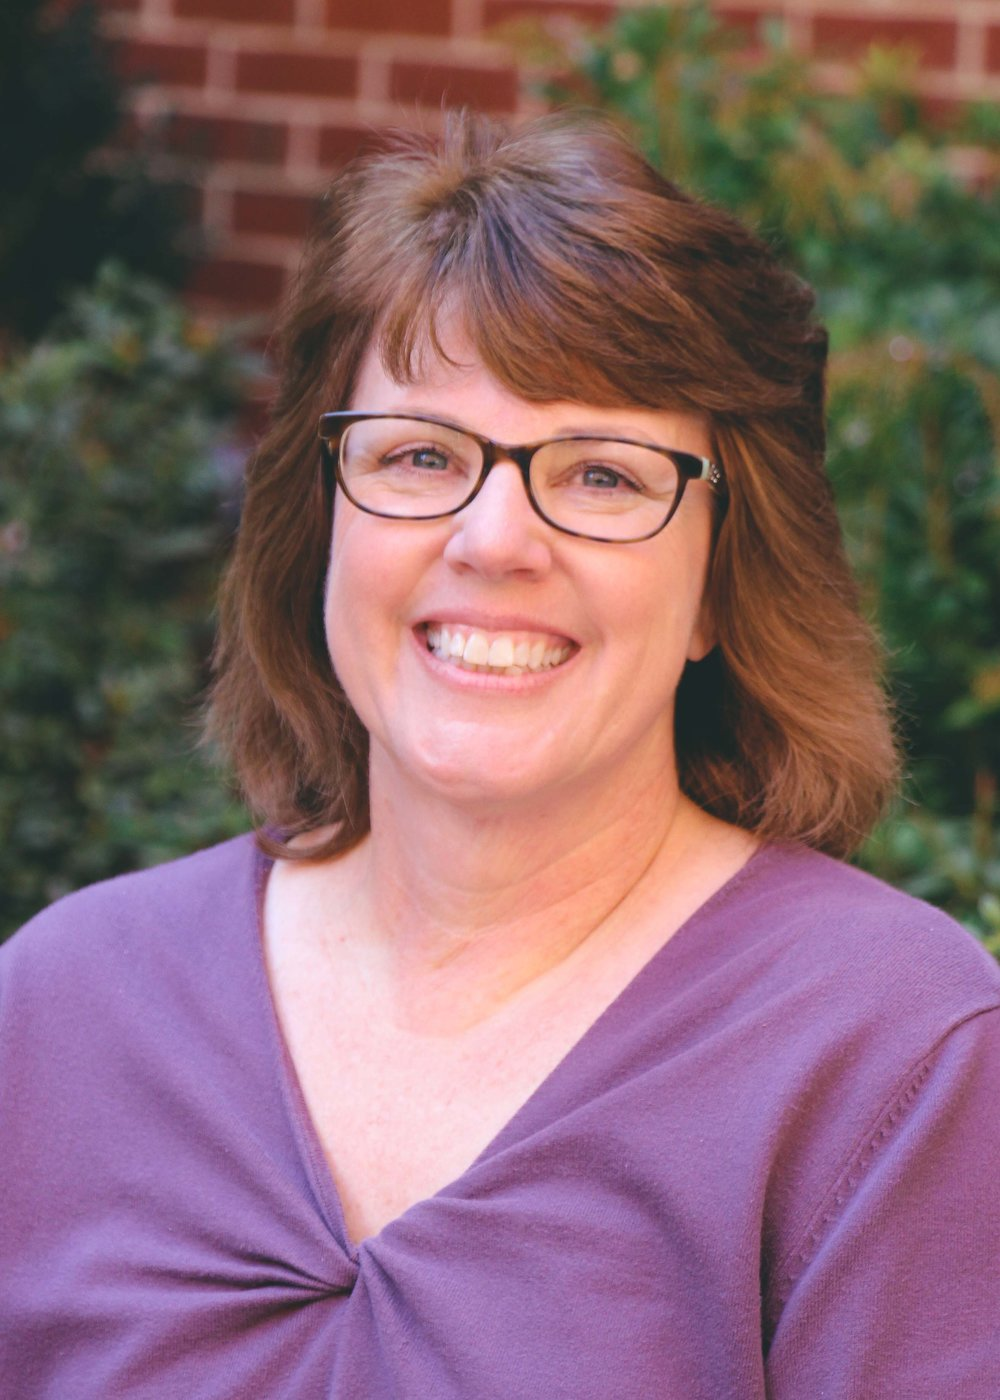 SARA KENNEDY / Interim CLC Worship Team Administrator - skennedy@bonsackbaptist.org